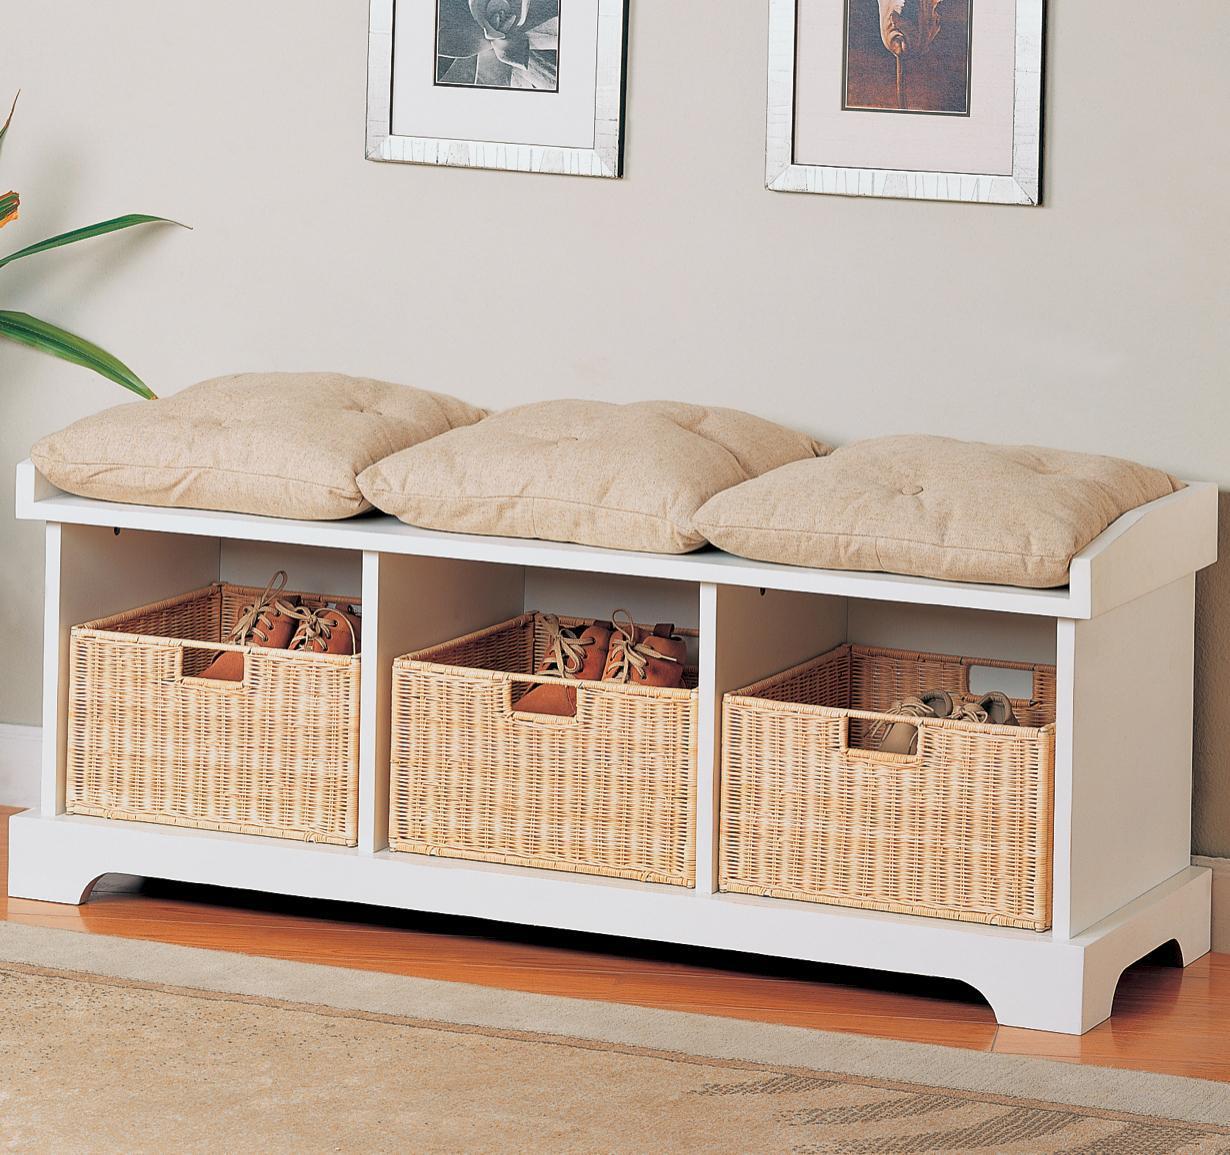 Z Gallerie Bedroom Furniture Bedroom Tv Cabinet Modern Bedroom Bookshelves Elegant Bedroom Furniture: Tips For Creating A Casual Yet Elegant Entryway